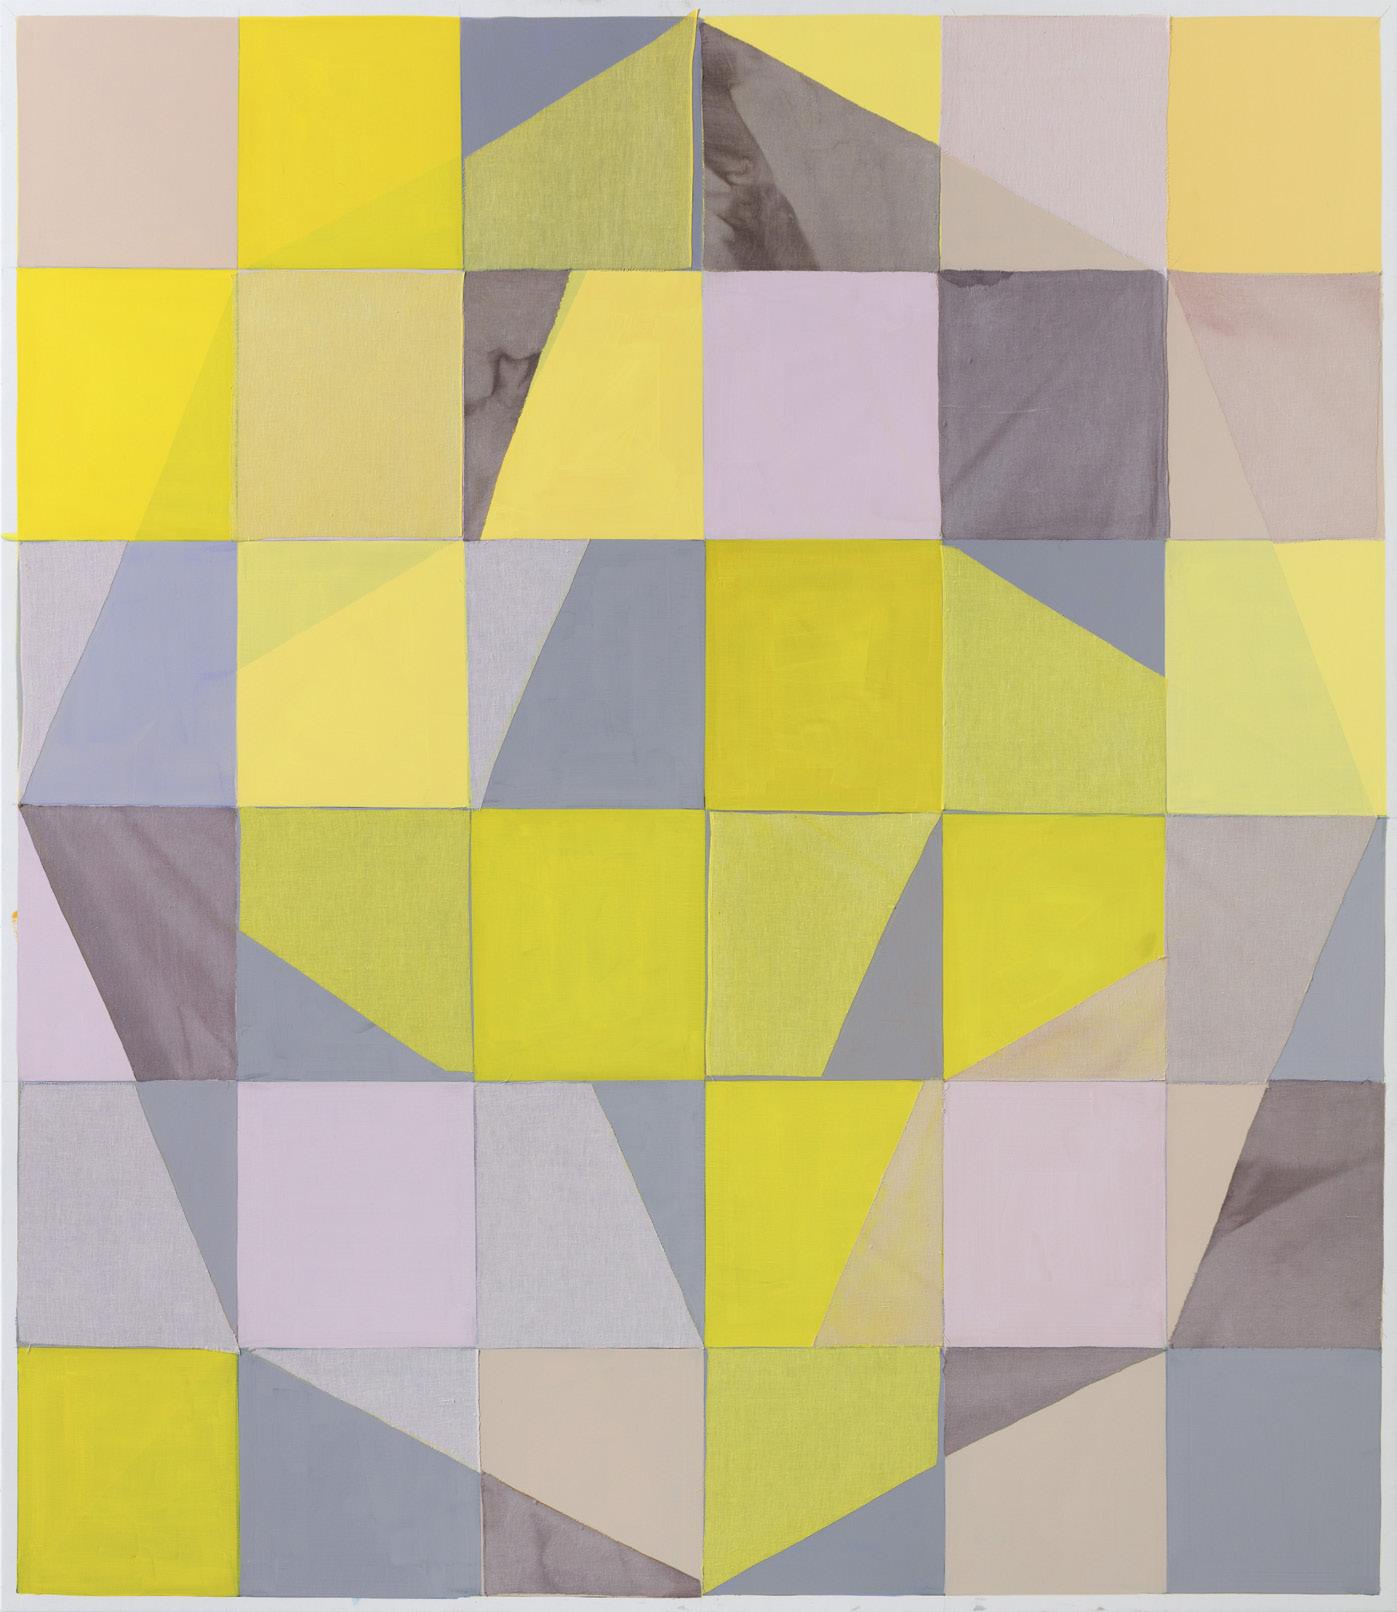 Simple Purity, 2016 Malene Landgreen